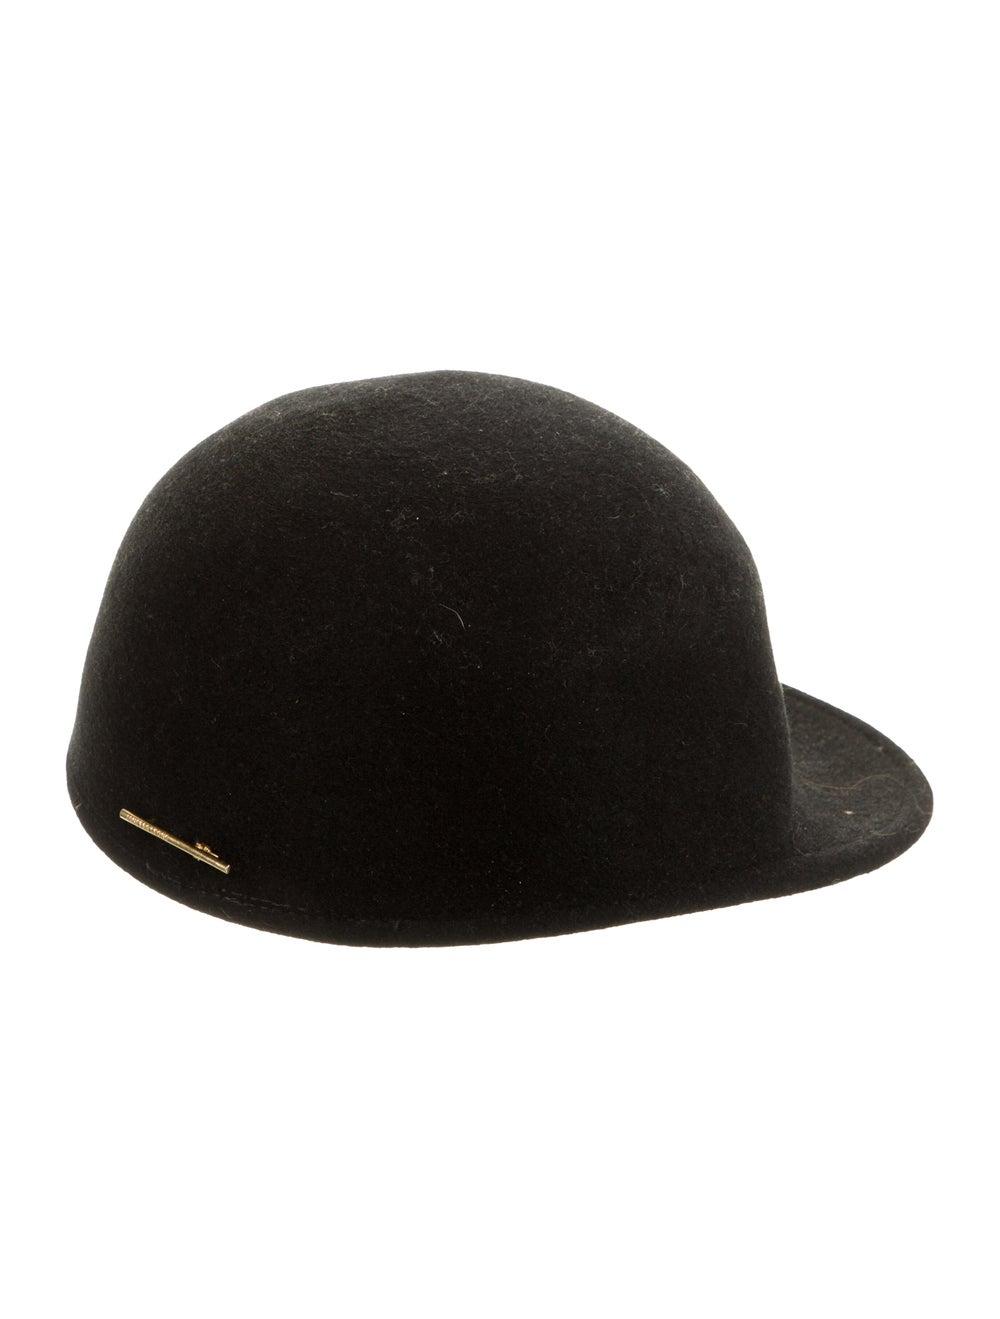 Janessa Leone Wool Jockey Hat Black - image 2